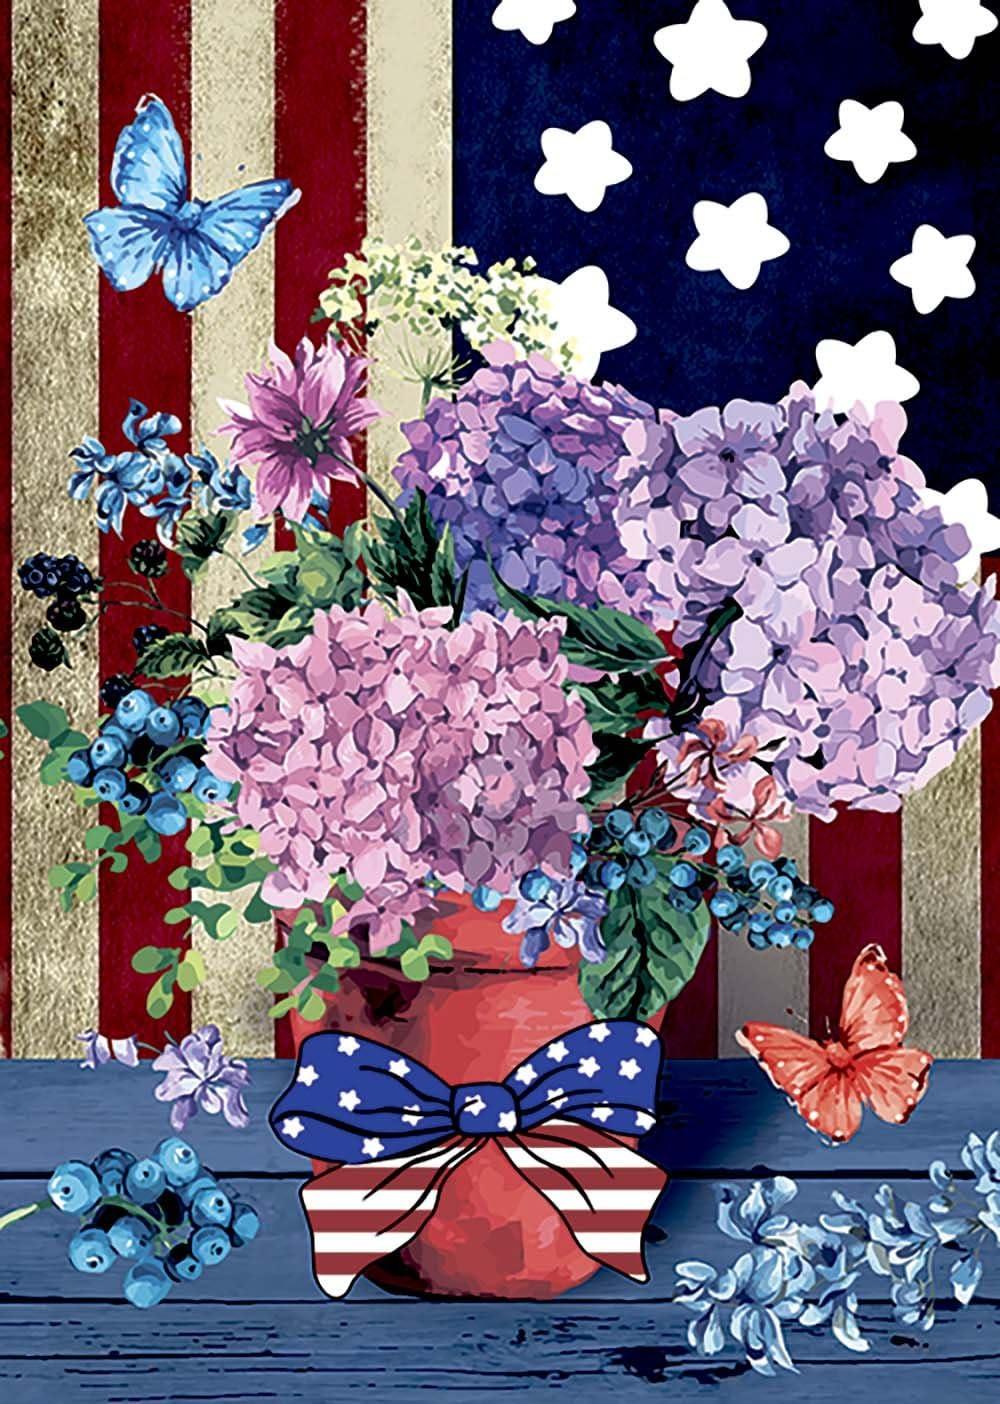 Morigins Patriotic Pansies 28 x 40 Inch Decorative Floral America Summer House Flag